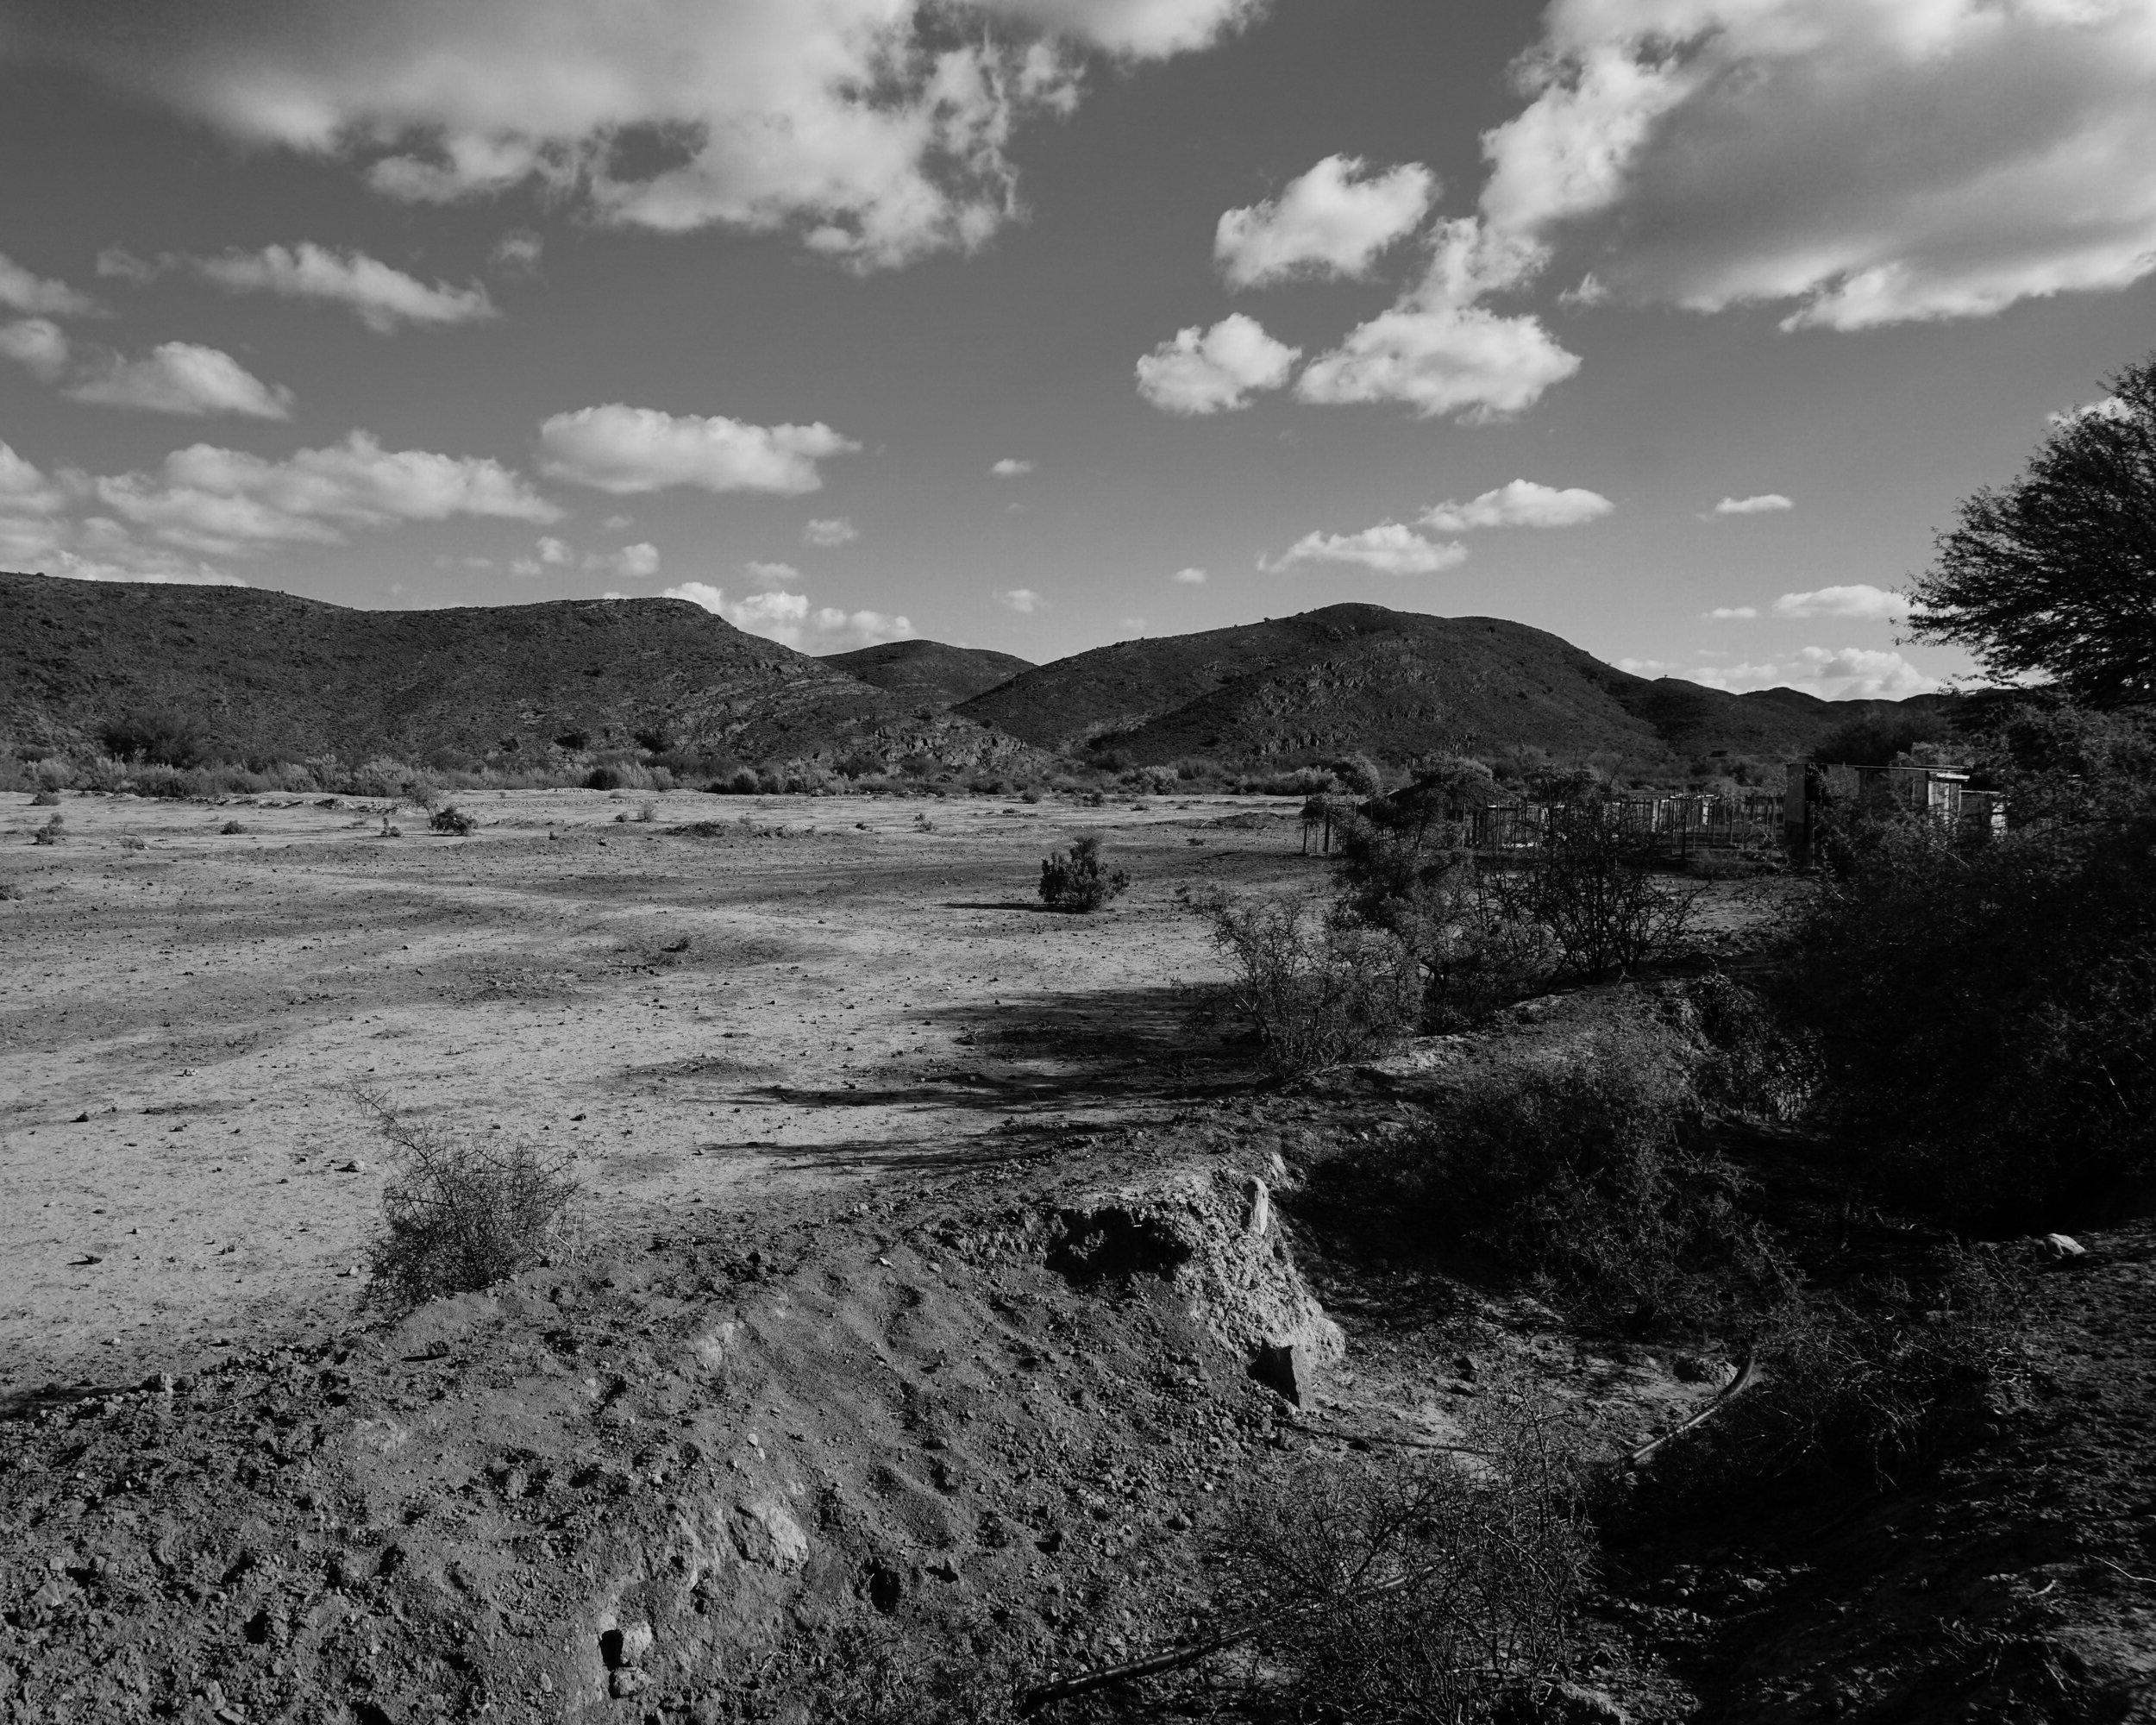 Klein Karoo: Andrew's Fields